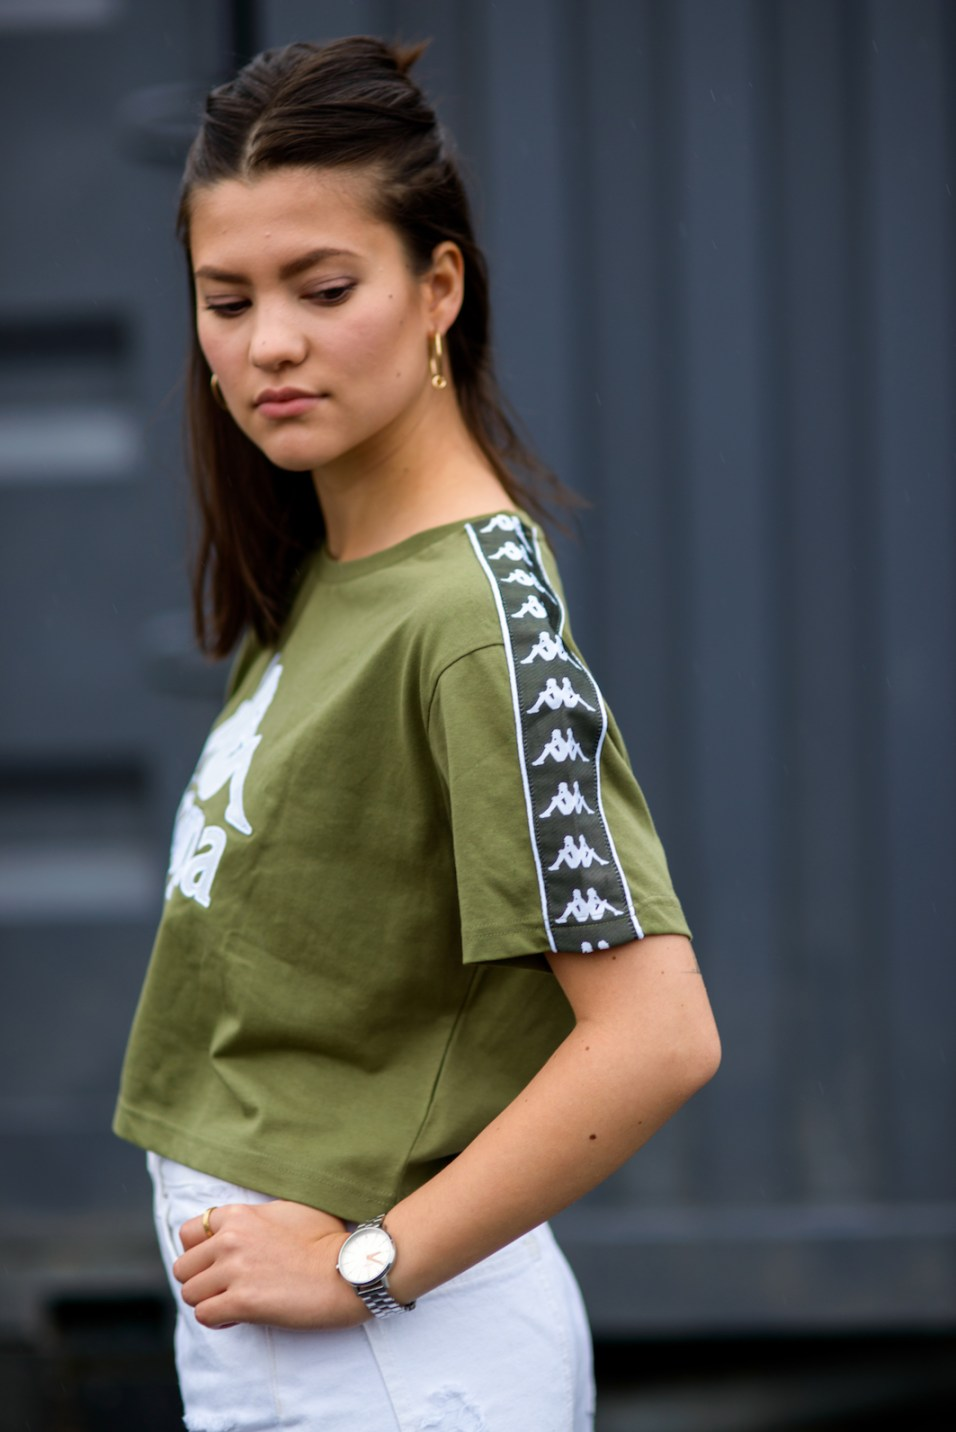 kappa look kappakrew blog mode fashion blogger10